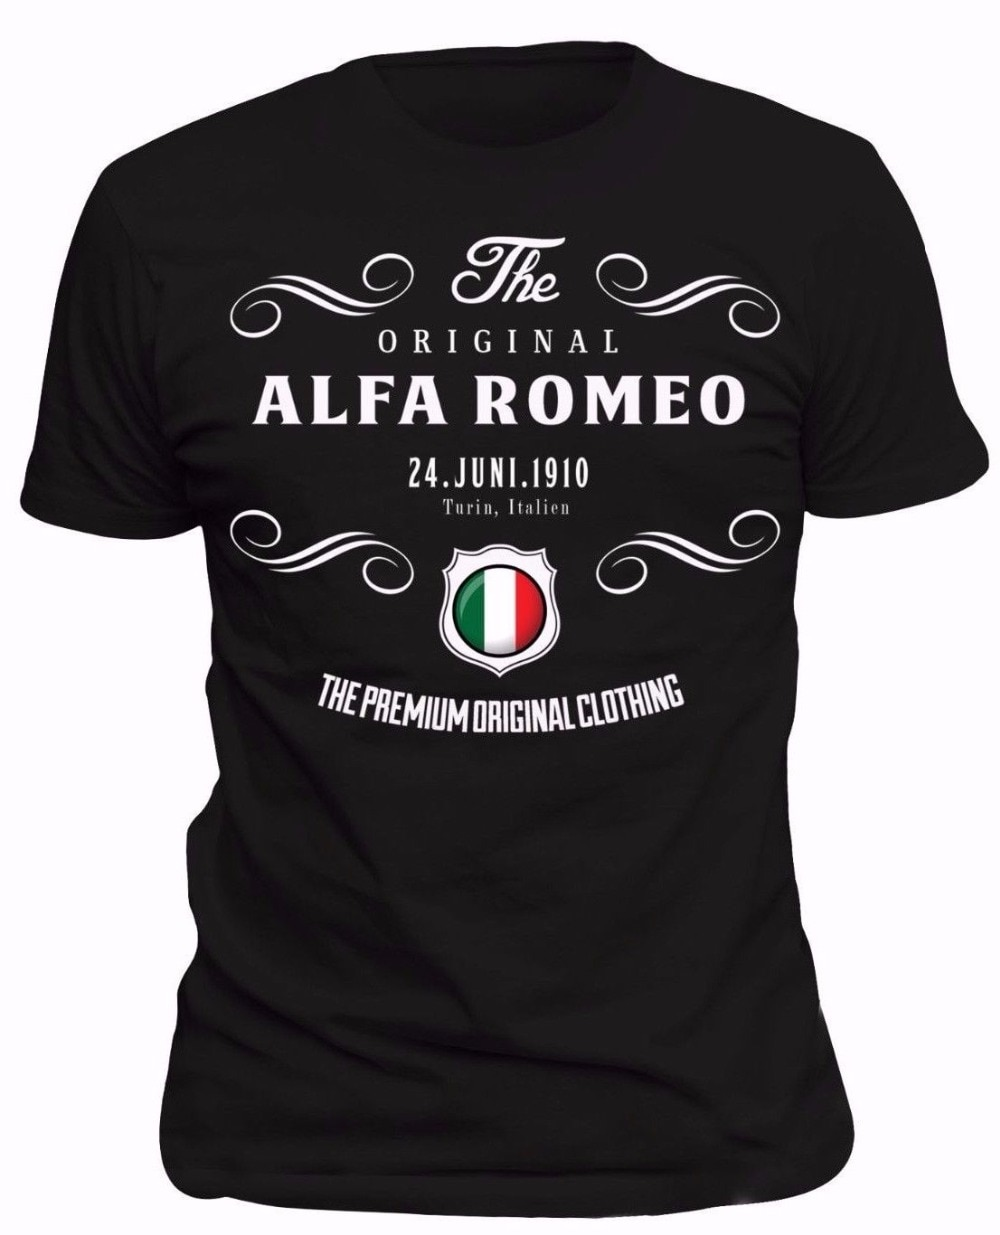 2019 marca de verano de alta calidad casual para hombres de verano de manga corta de algodón hombres camiseta fitness camiseta Alfa-Romeo Power camiseta